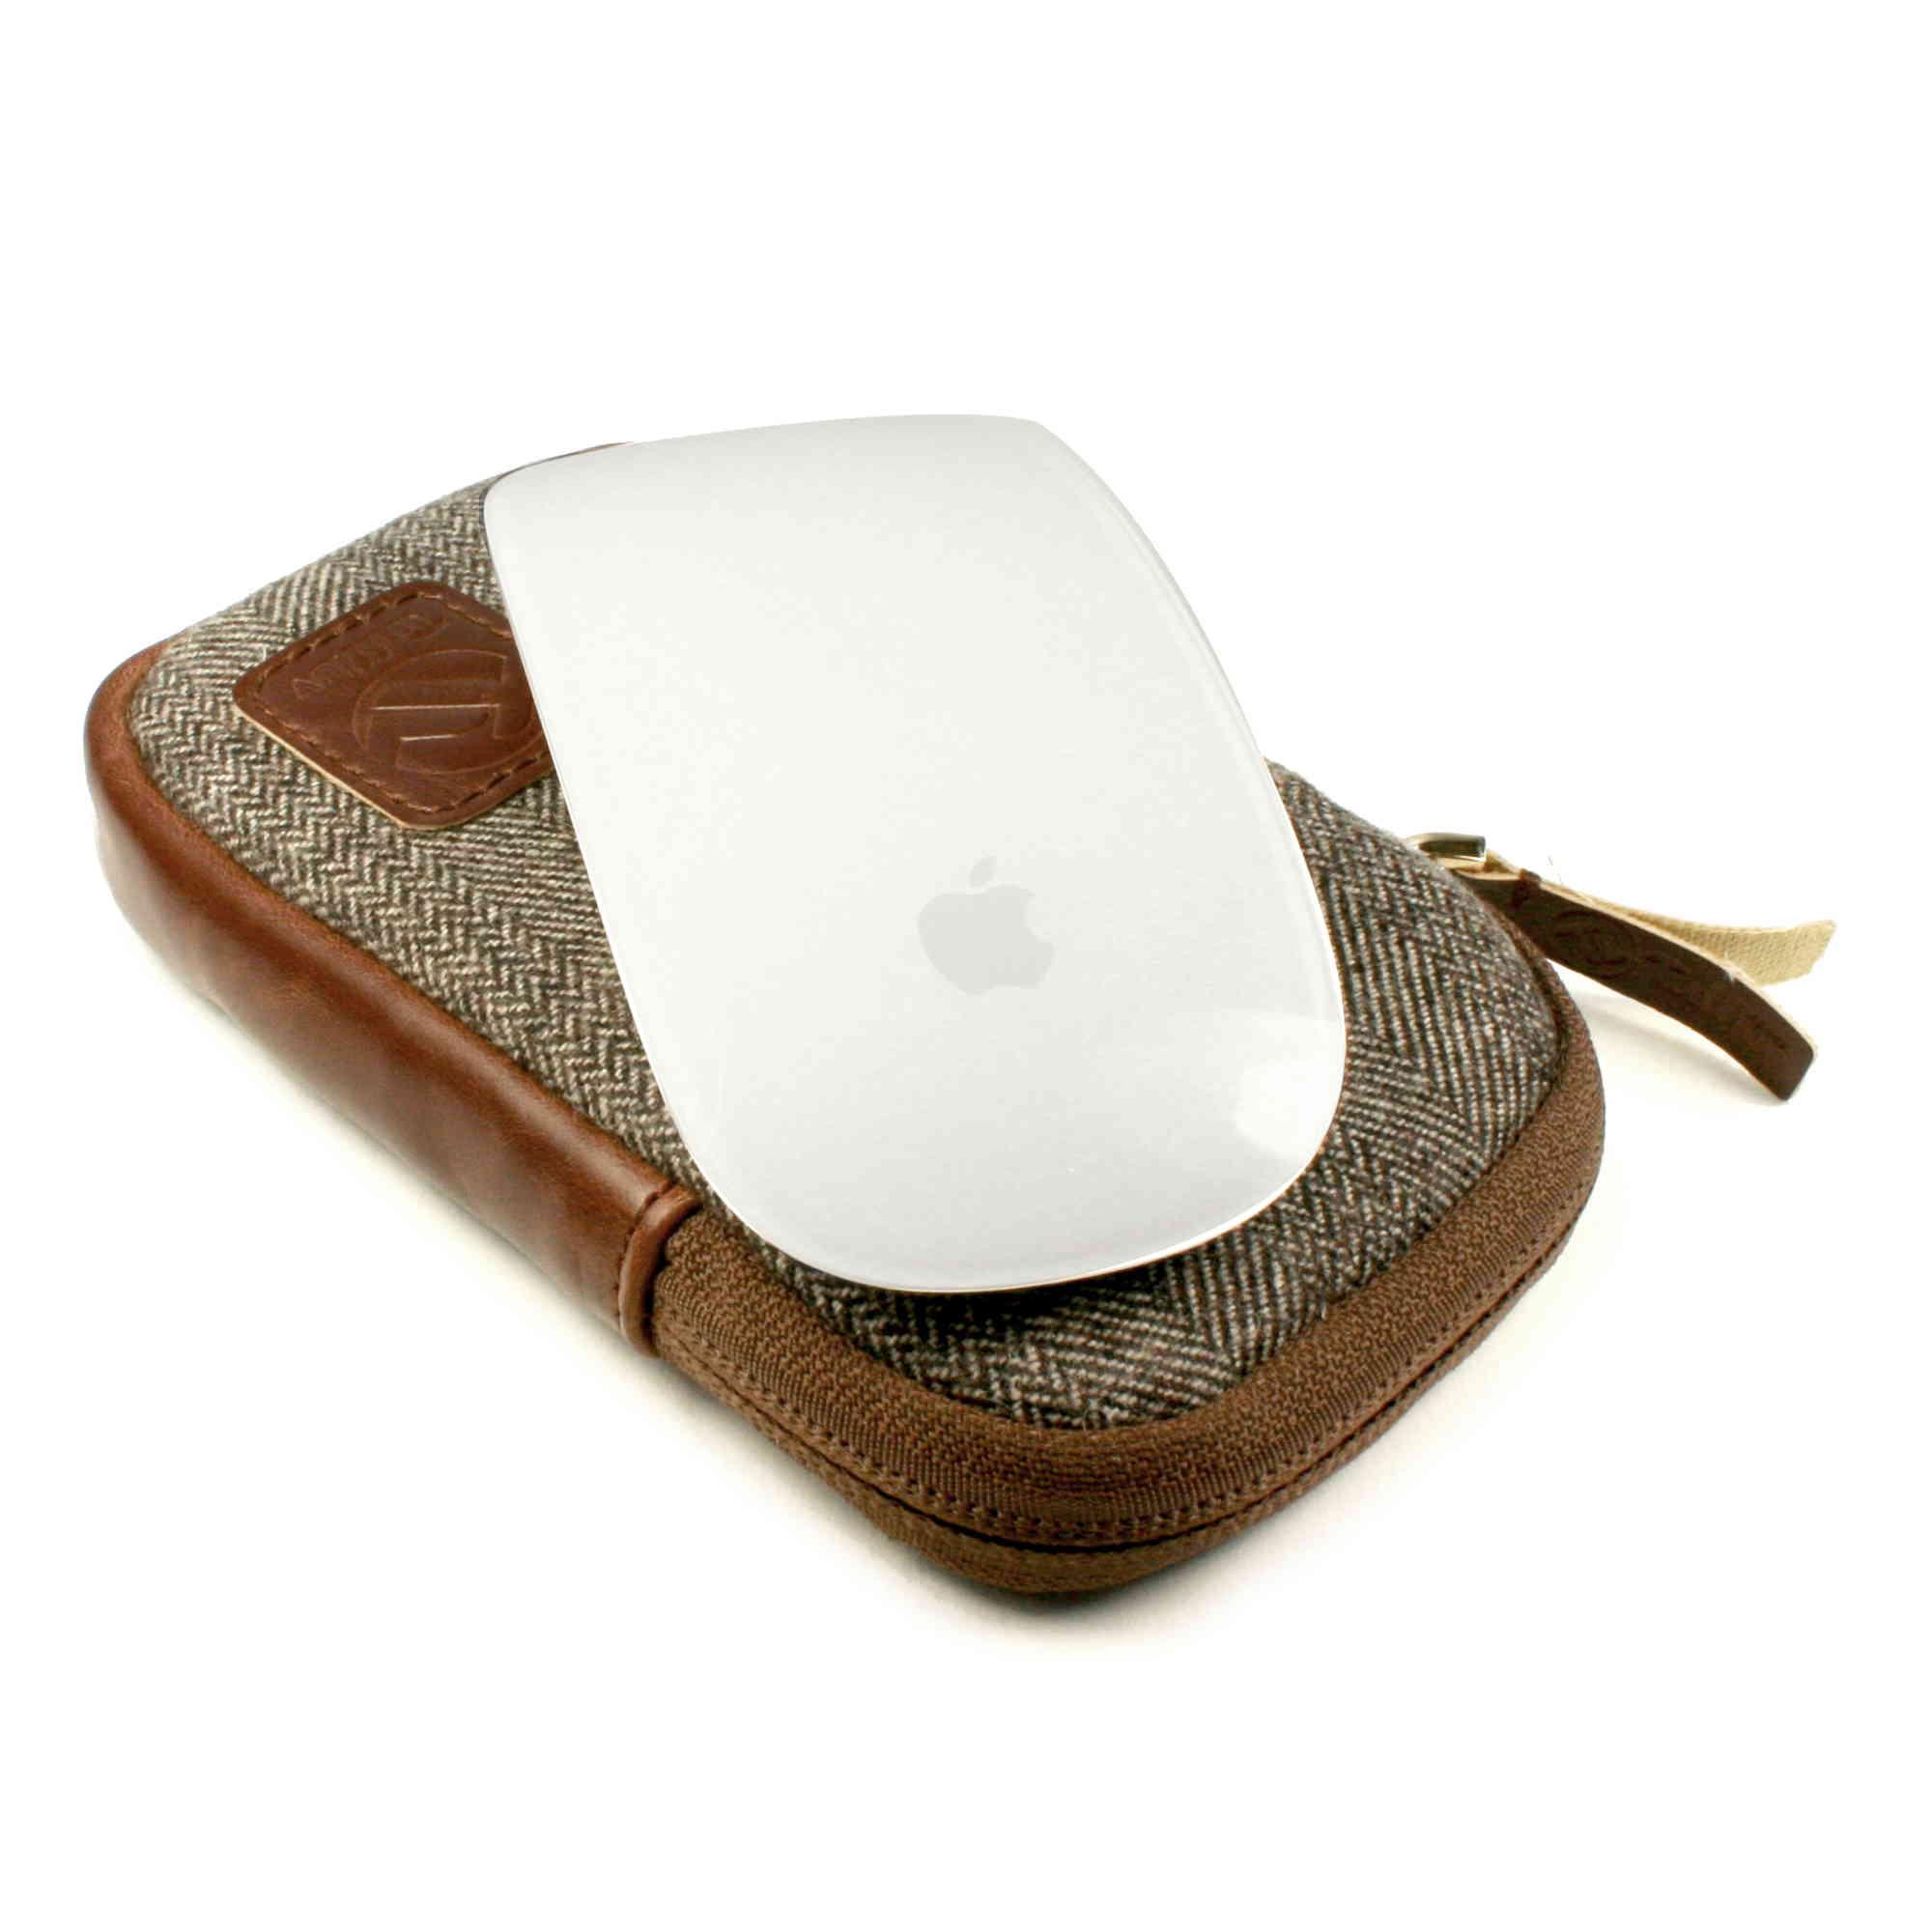 Sentinel TUFF LUV Herringbone Tweed Travel Case for Apple Magic Mouse 1 & 2  - Brown